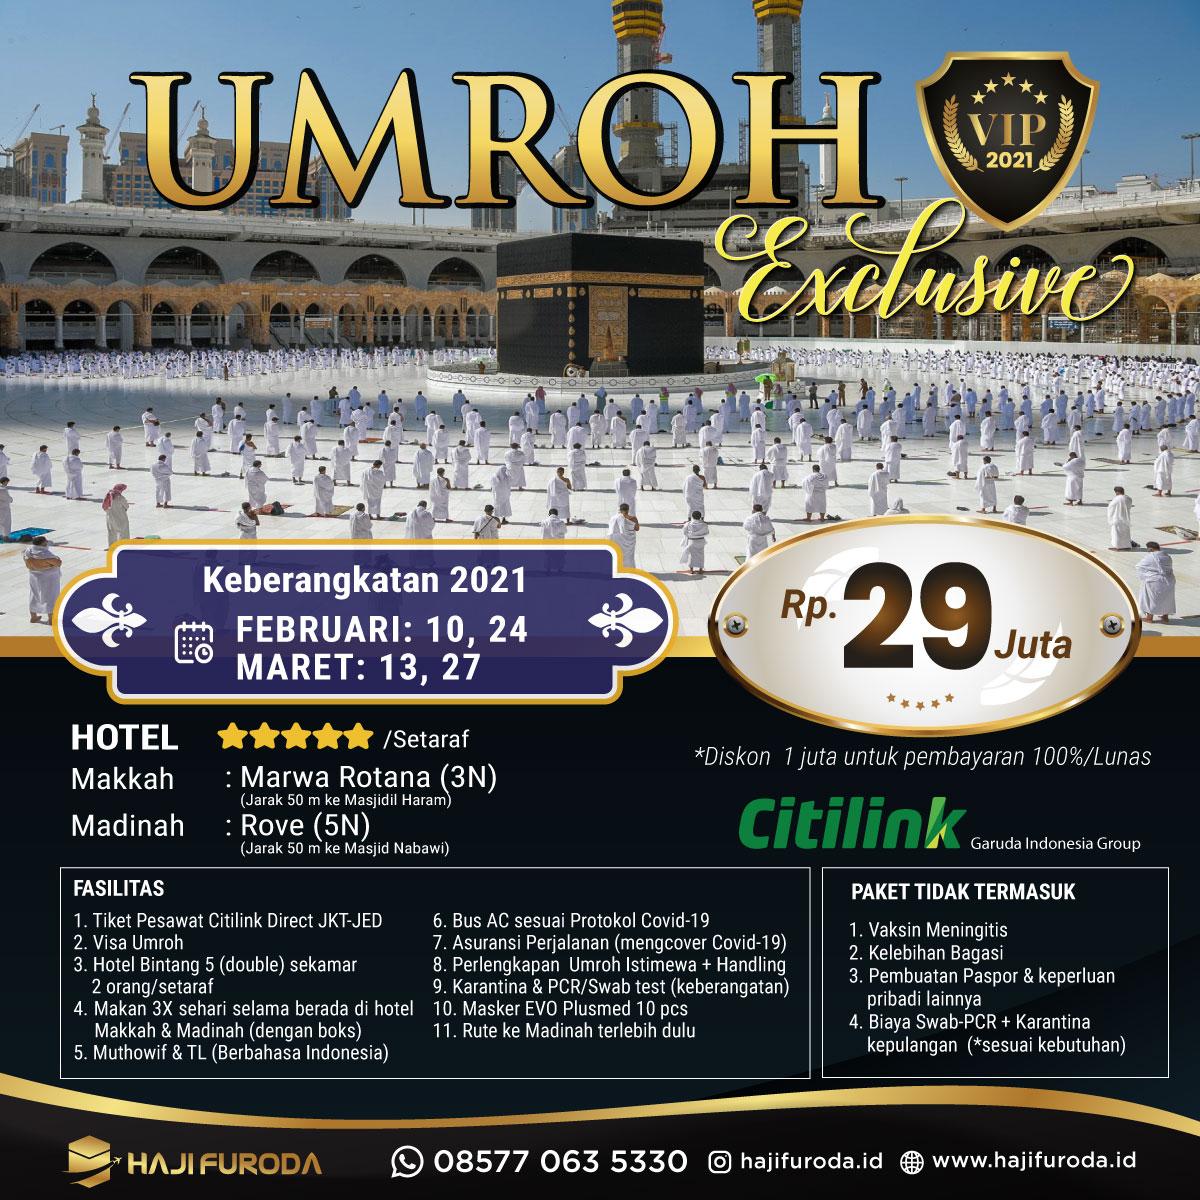 Promo Umroh Februari Maret 2021 bersama Haji Furoda